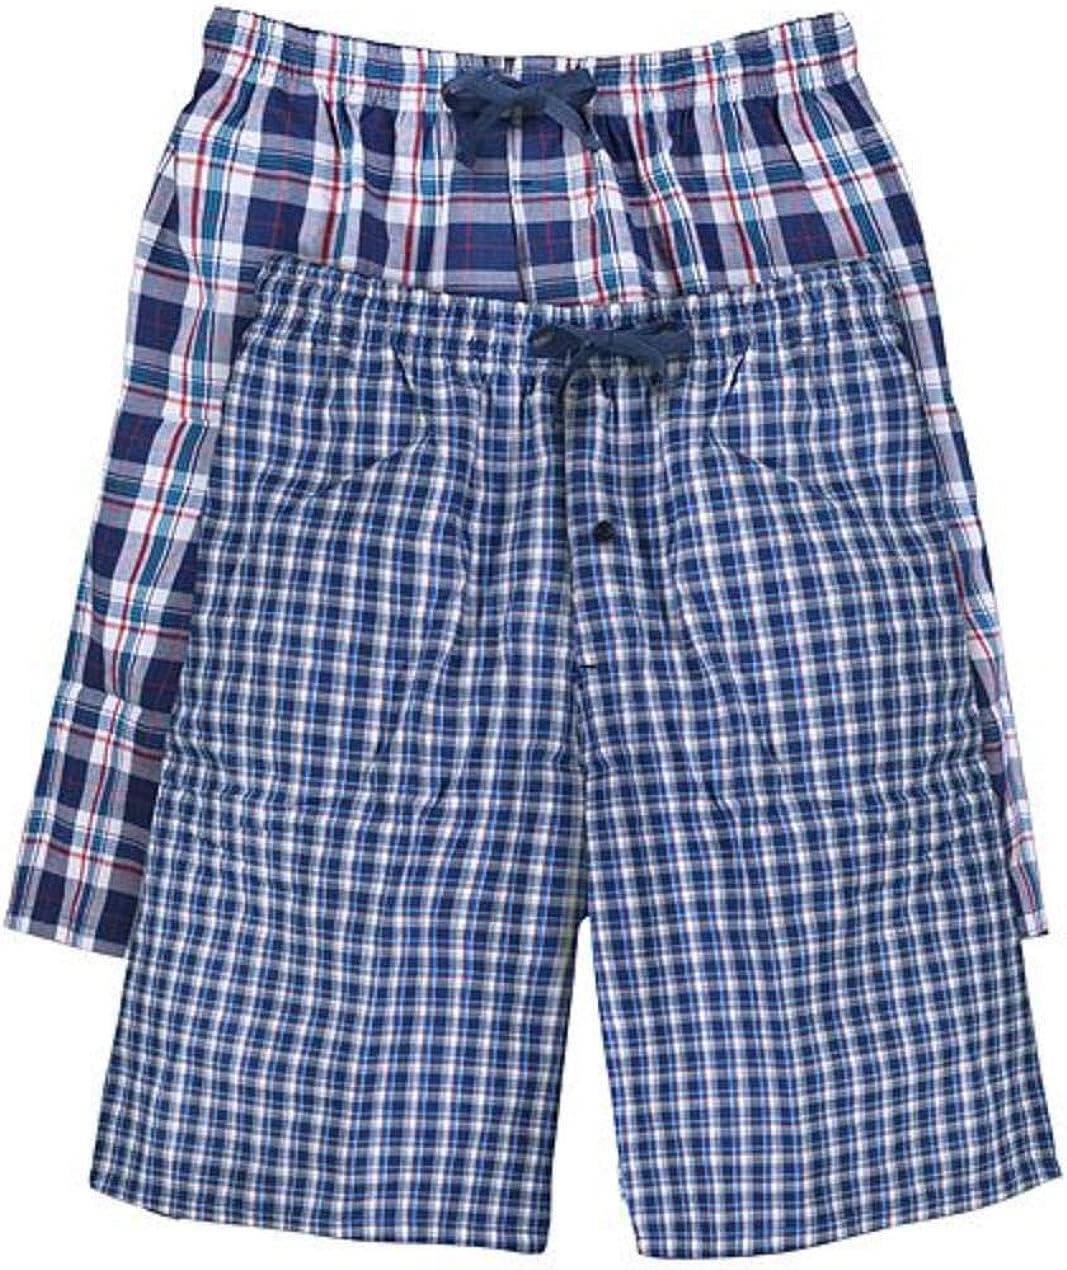 Hanes Men's 2-Pack Woven Pajama Short at  Men's Clothing store